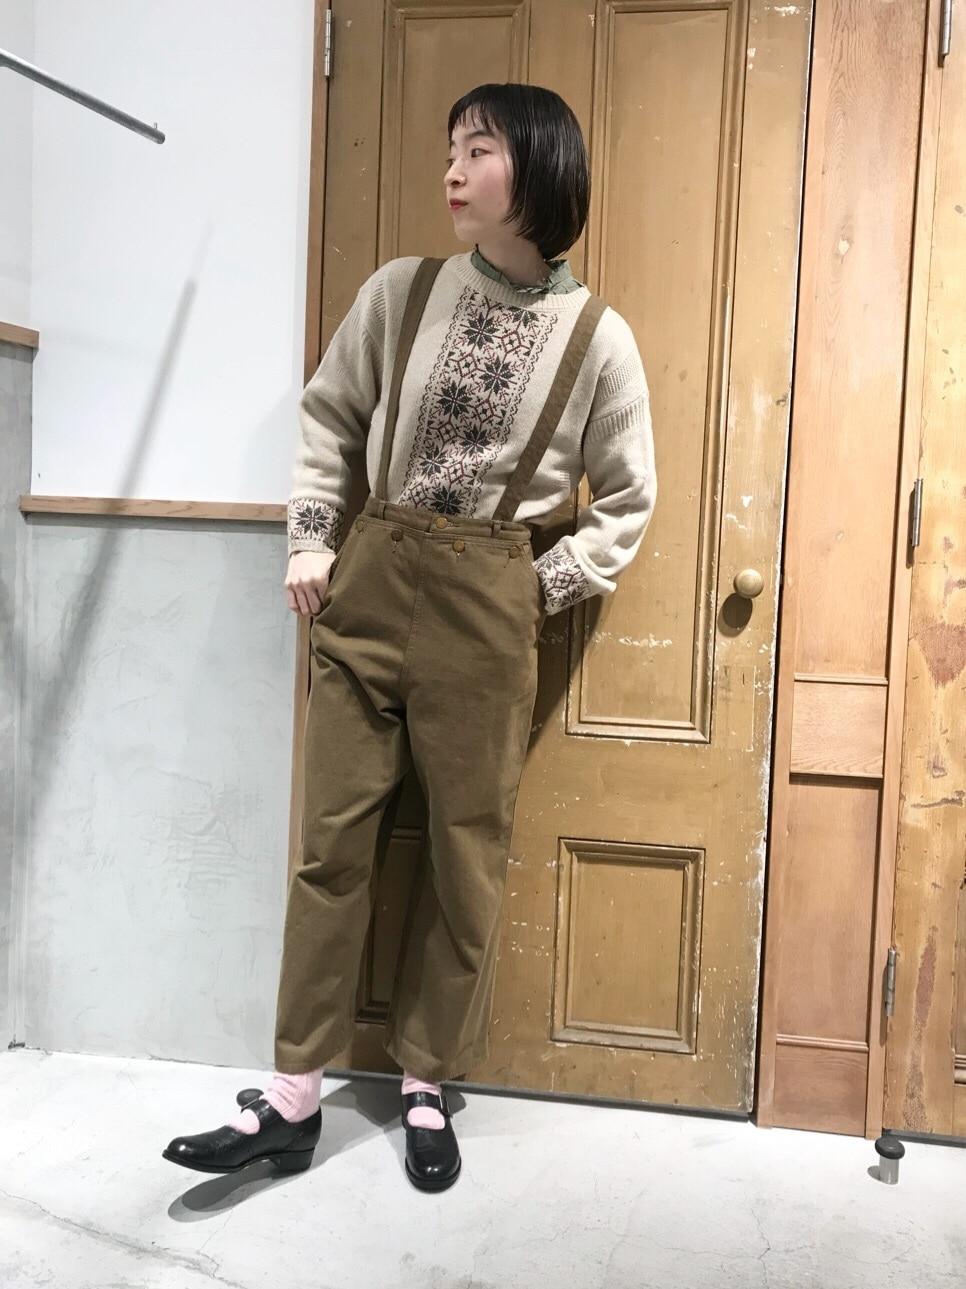 Malle chambre de charme ルミネ新宿 身長:164cm 2020.11.12